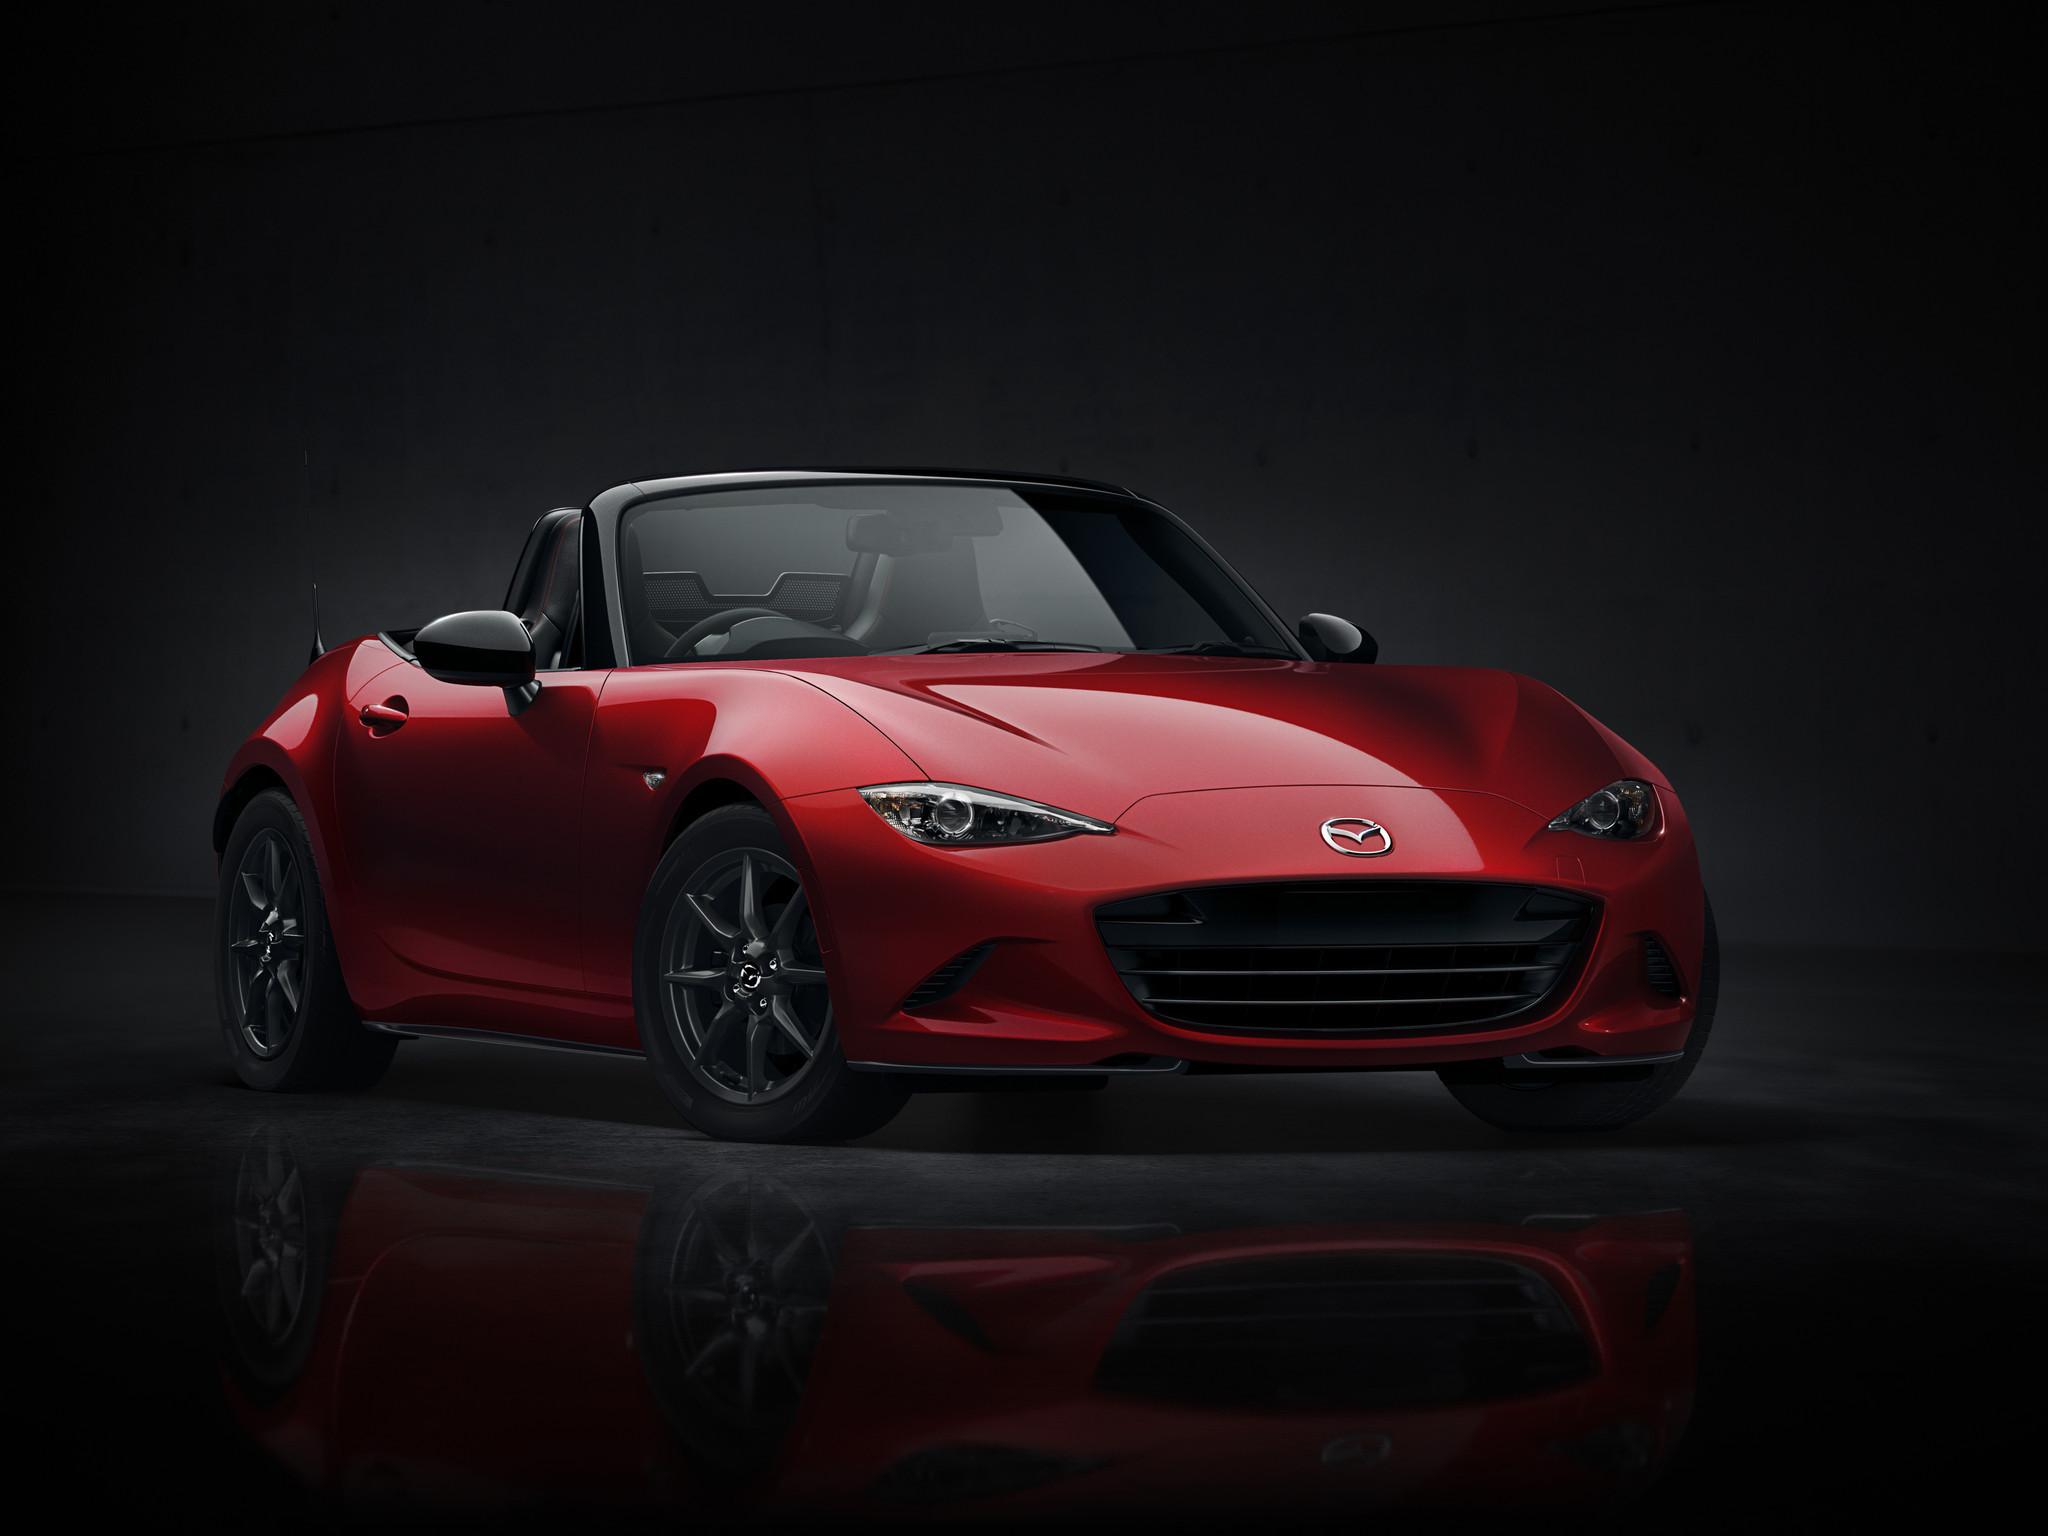 Mazda reveals newest mx 5 miata 25 years after original model la times